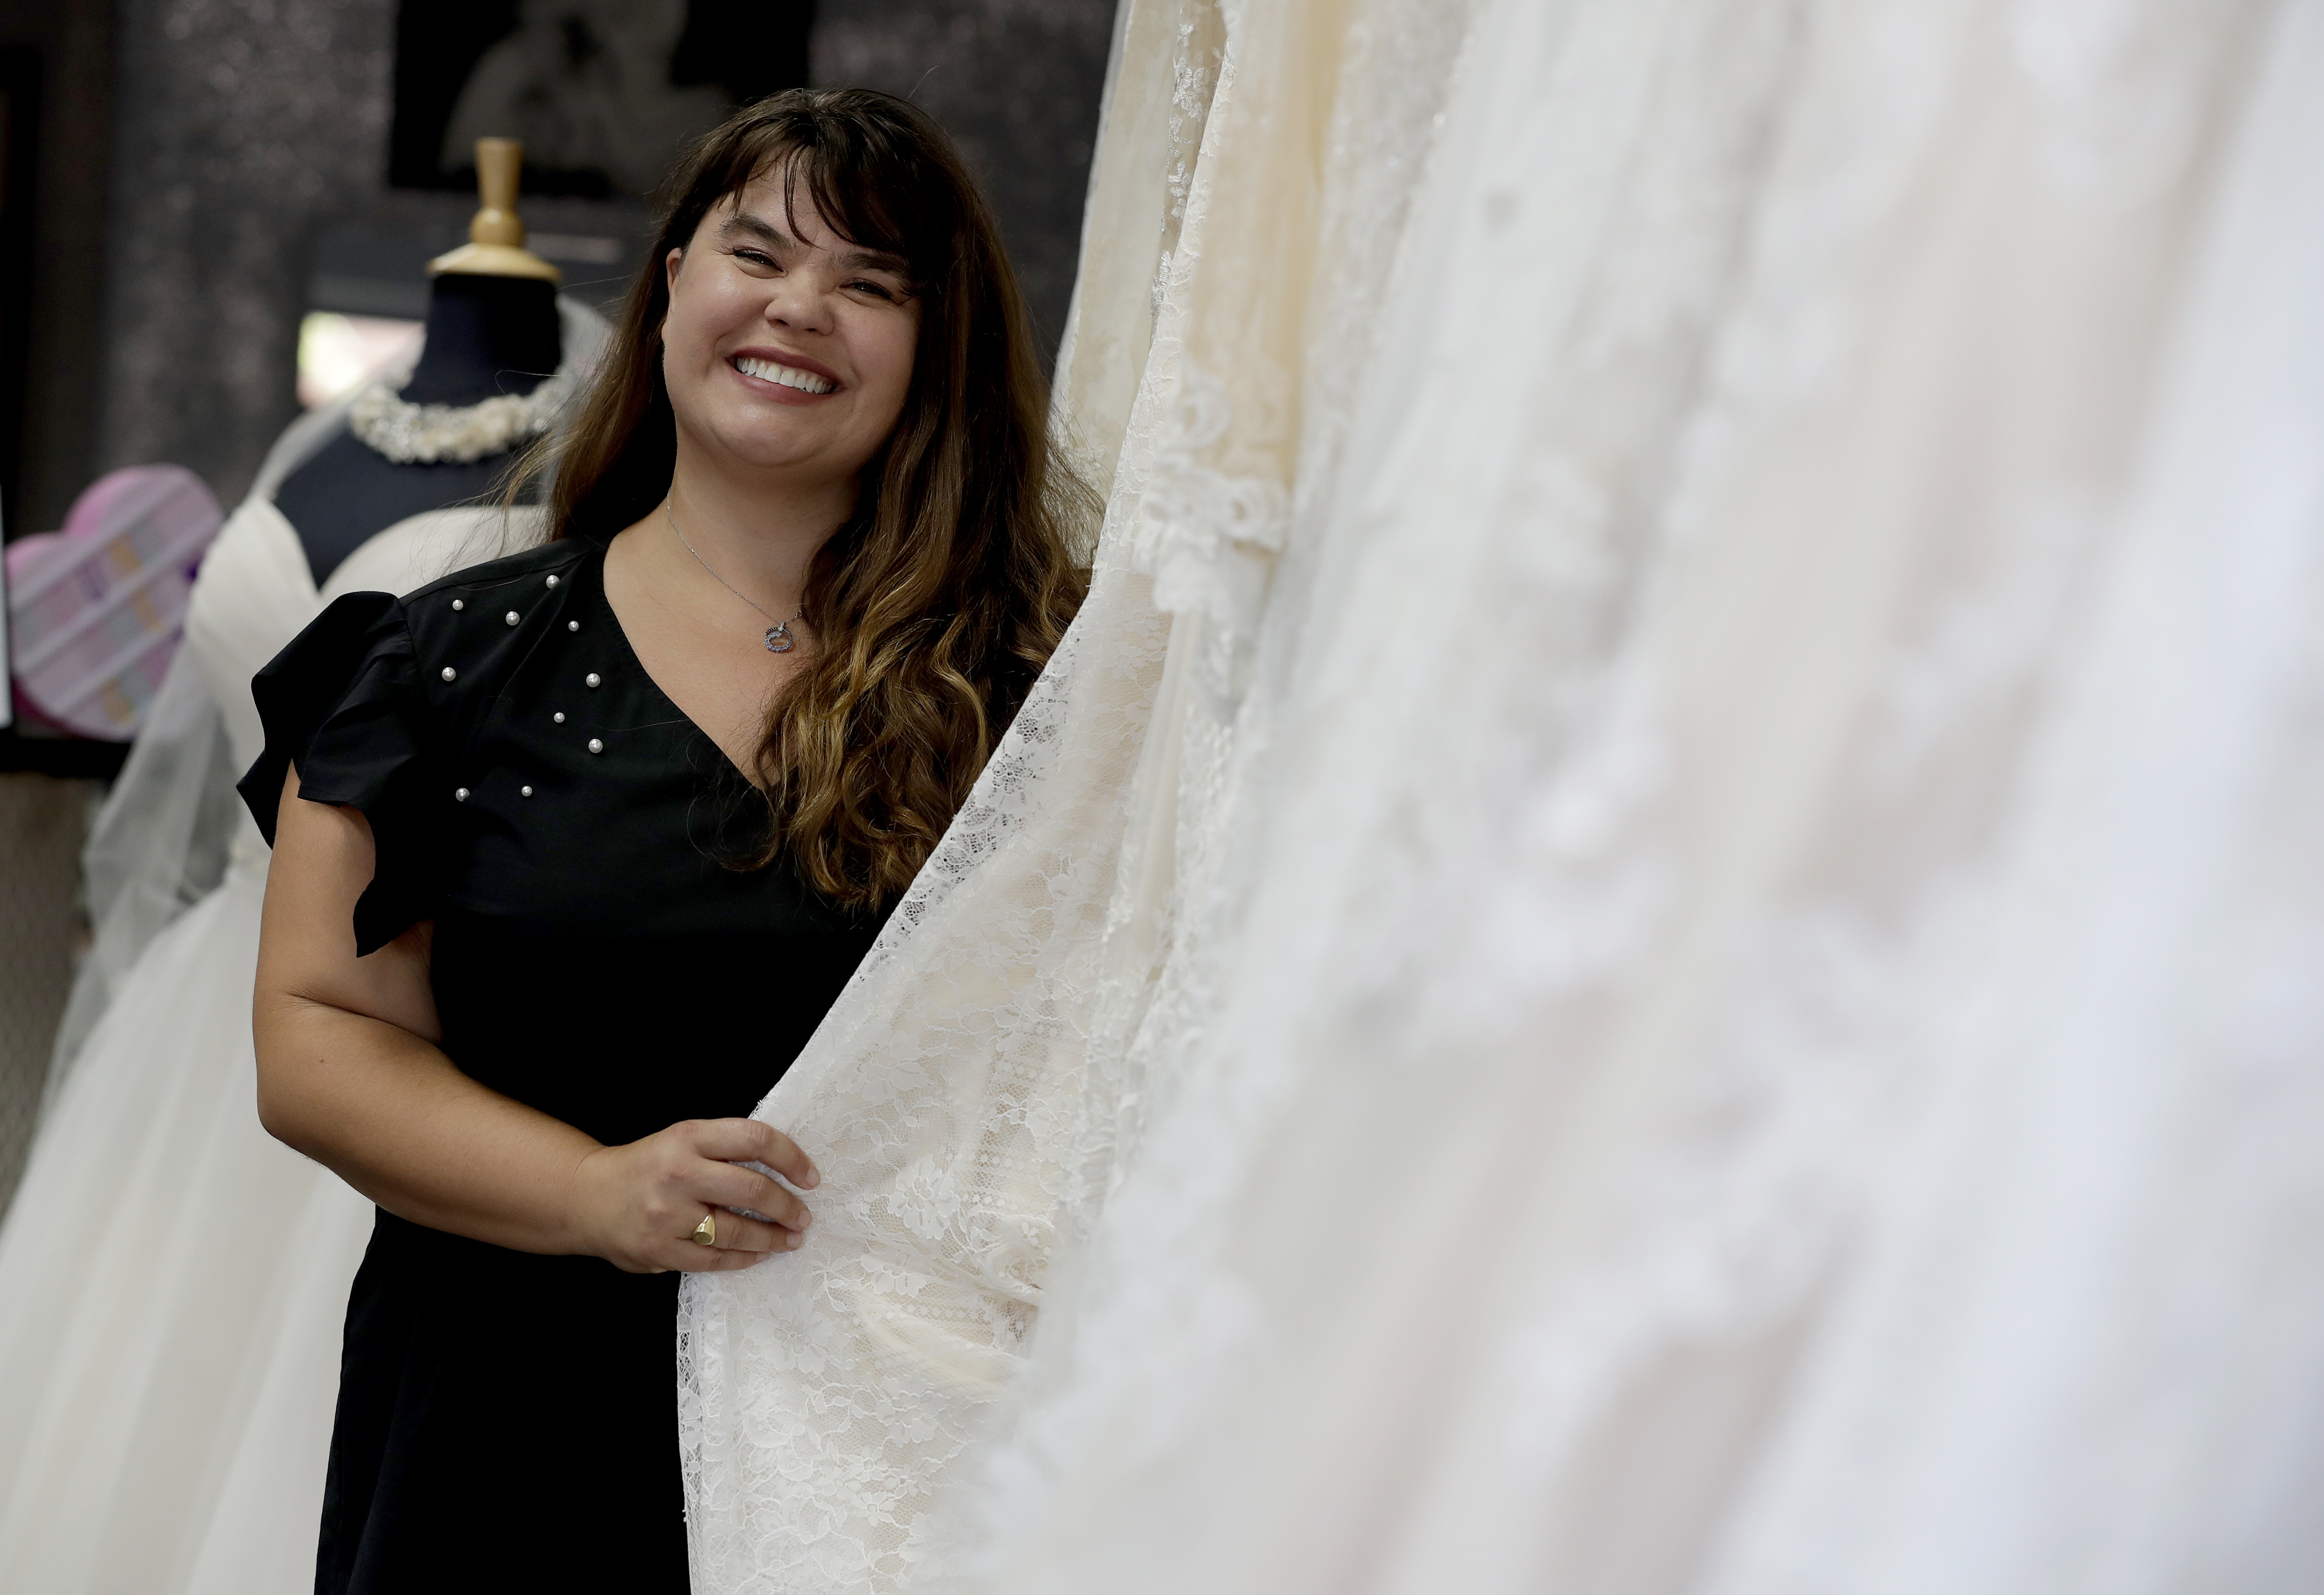 Virginia Beach bridal boutique to show teacher appreciation by ...